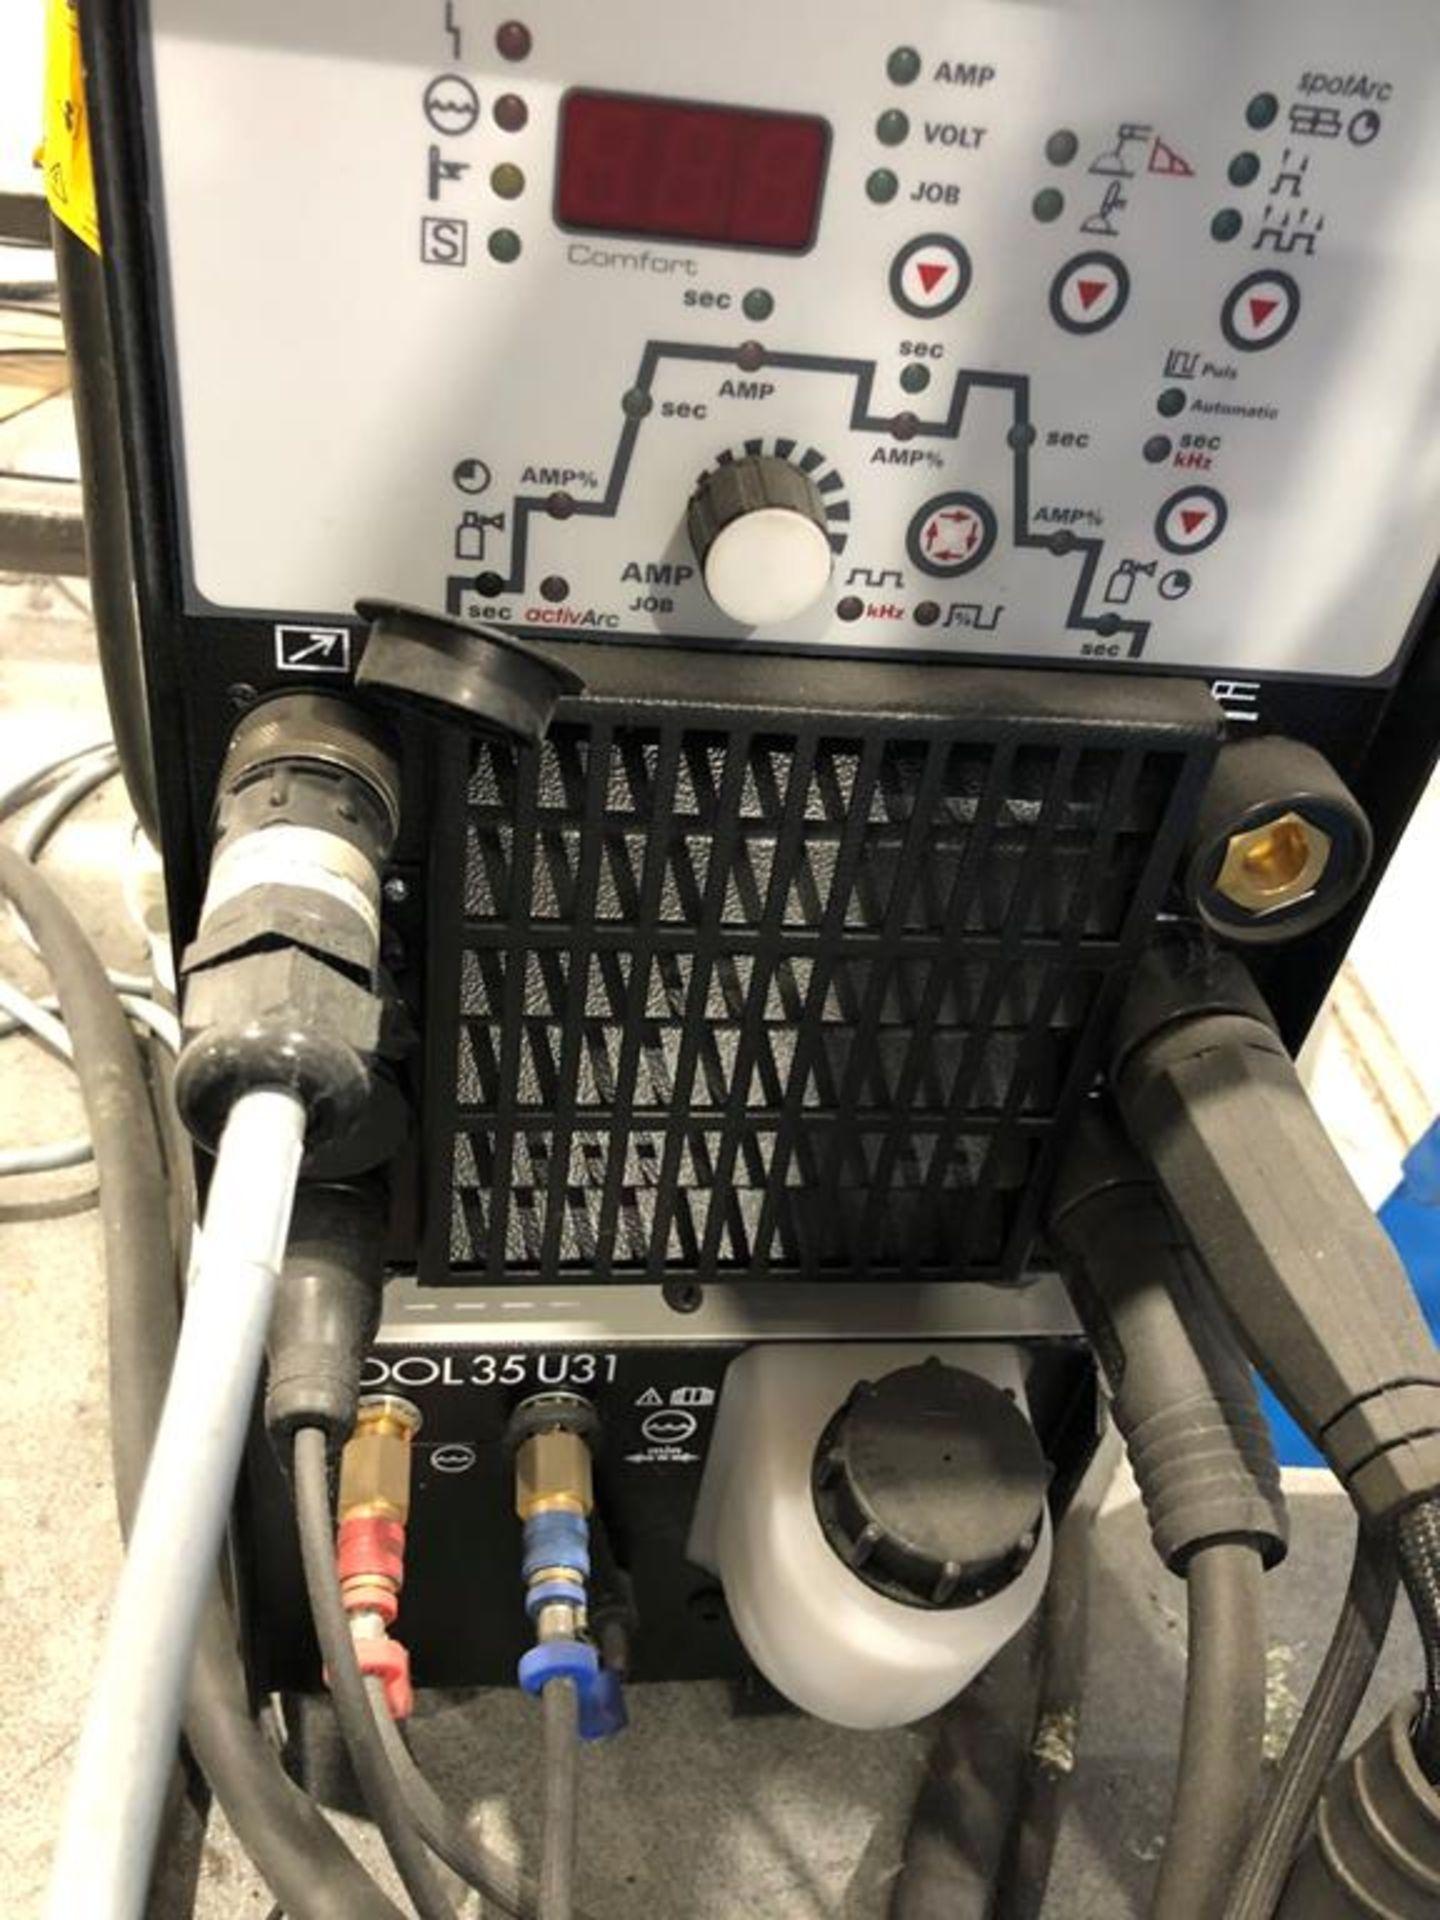 Unused 2017 EWM Tetrix 300 Comfort TM TIG DC Welding Machine - Image 3 of 3